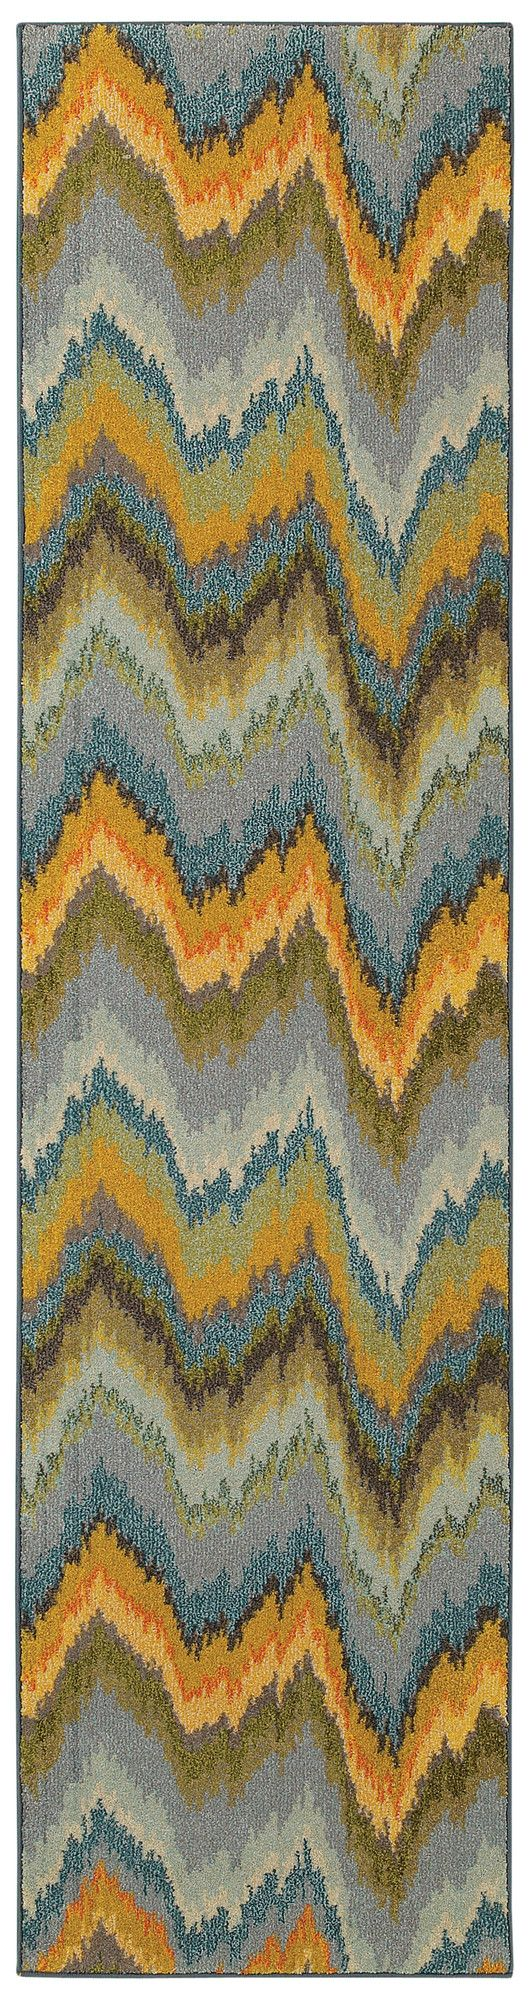 Aura Chevron Waves Yellow/Blue Area Rug